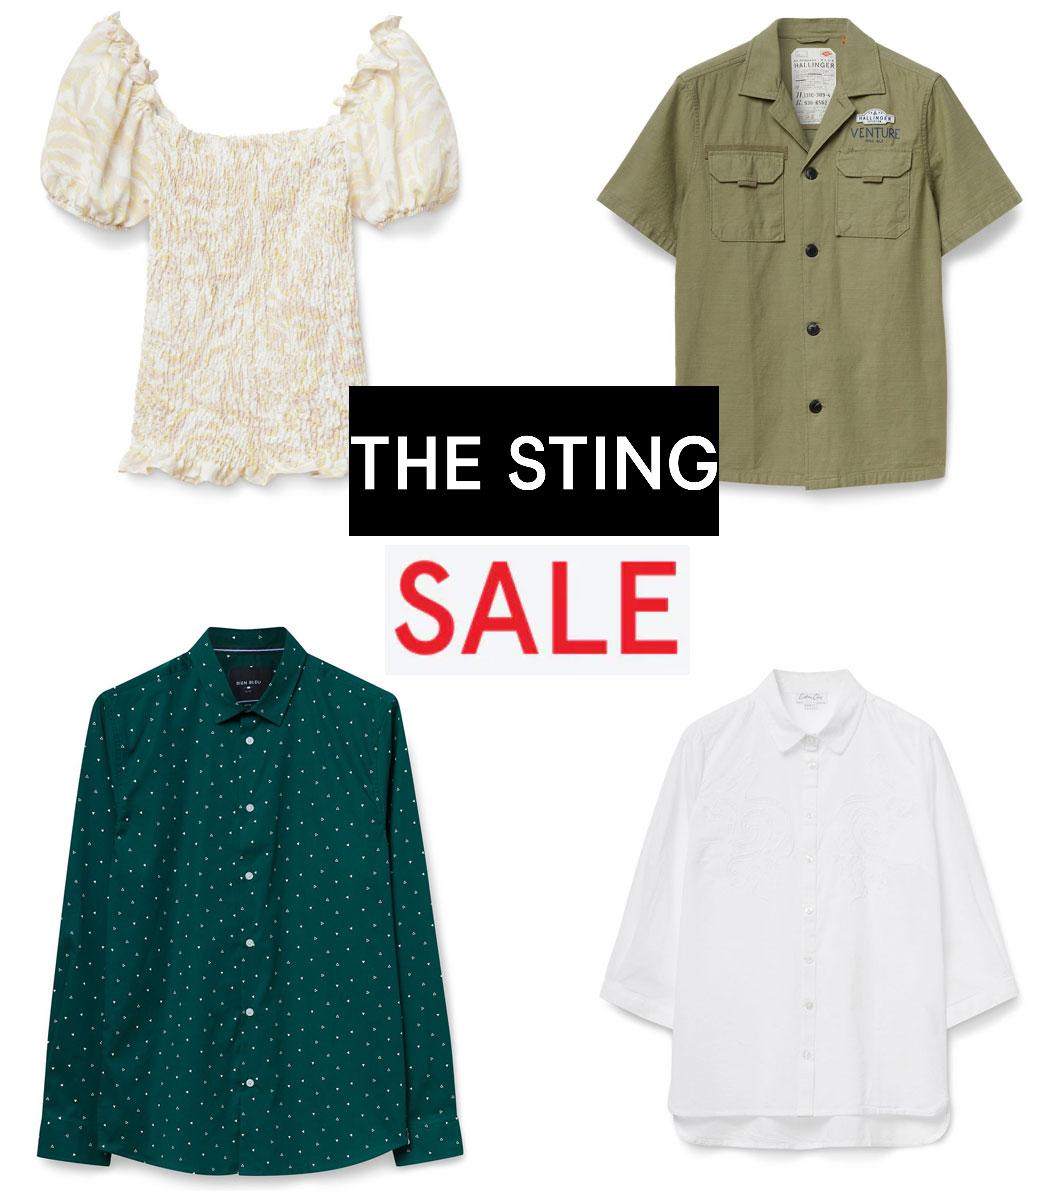 Veel SALE tot €9,95 = tot 85% korting @ The Sting